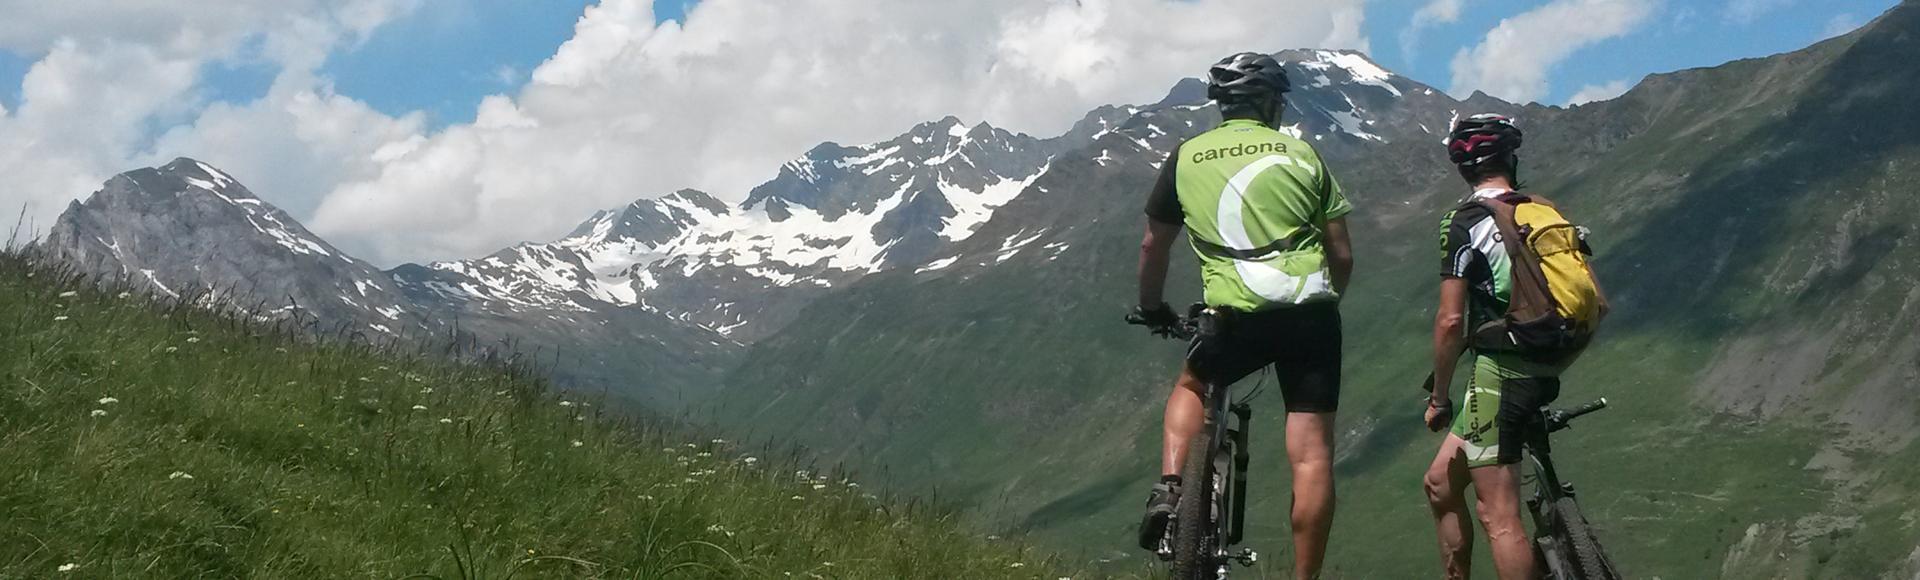 Disfrutes de la bici?